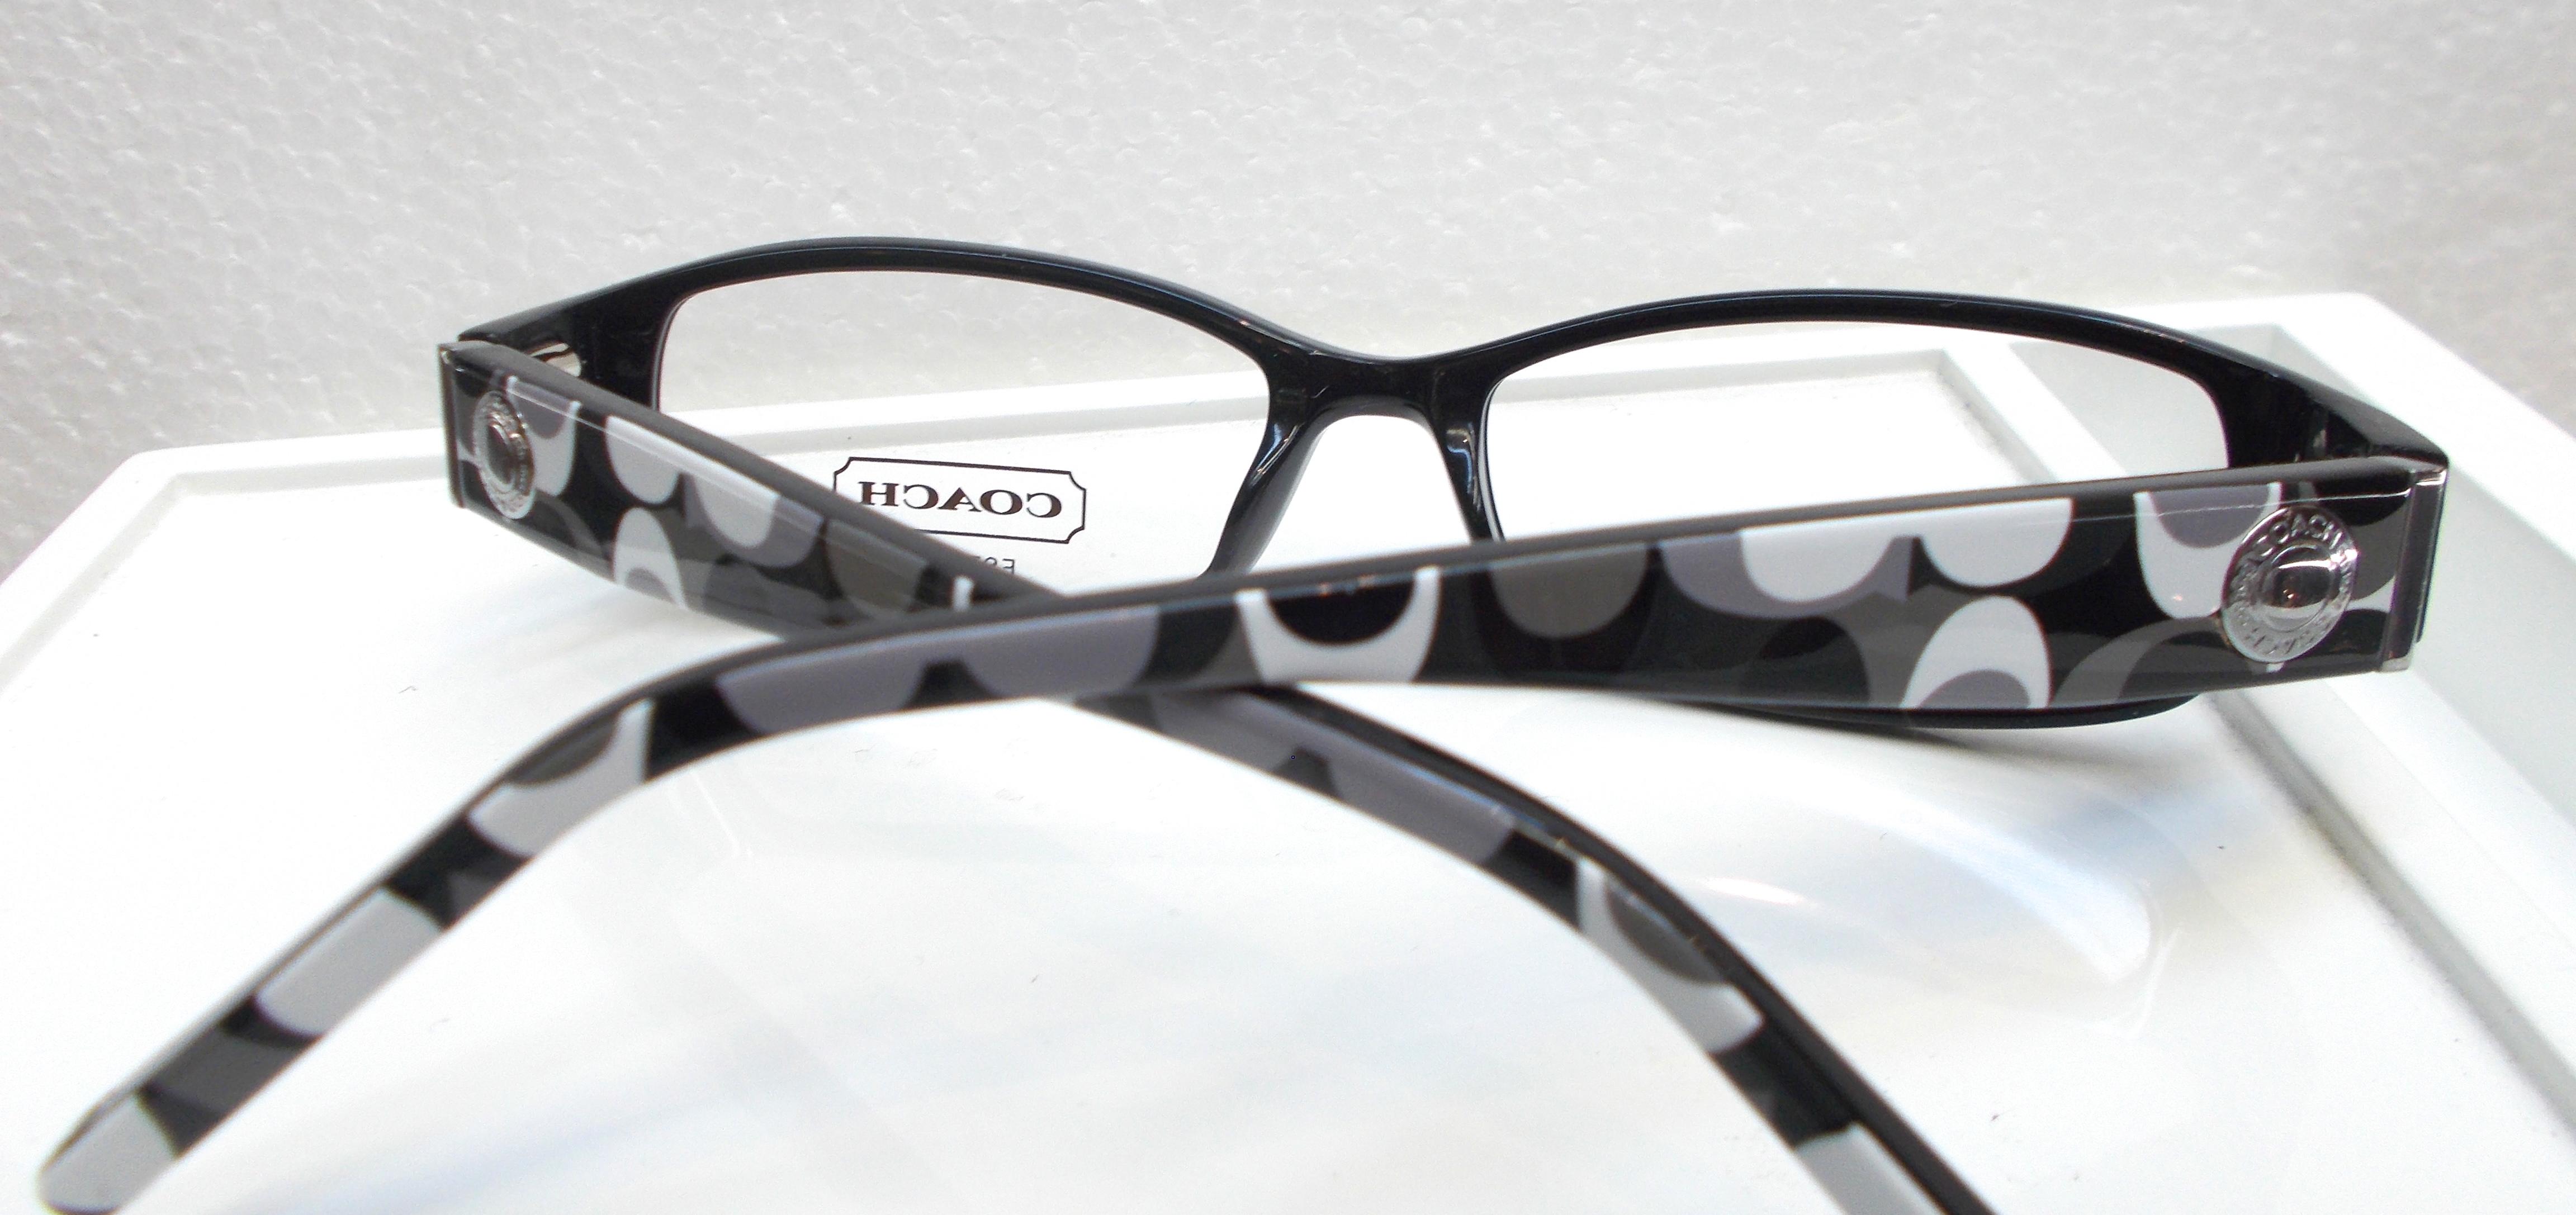 H&S Optical Coach Eyewear Roberta (843) Black Online ...